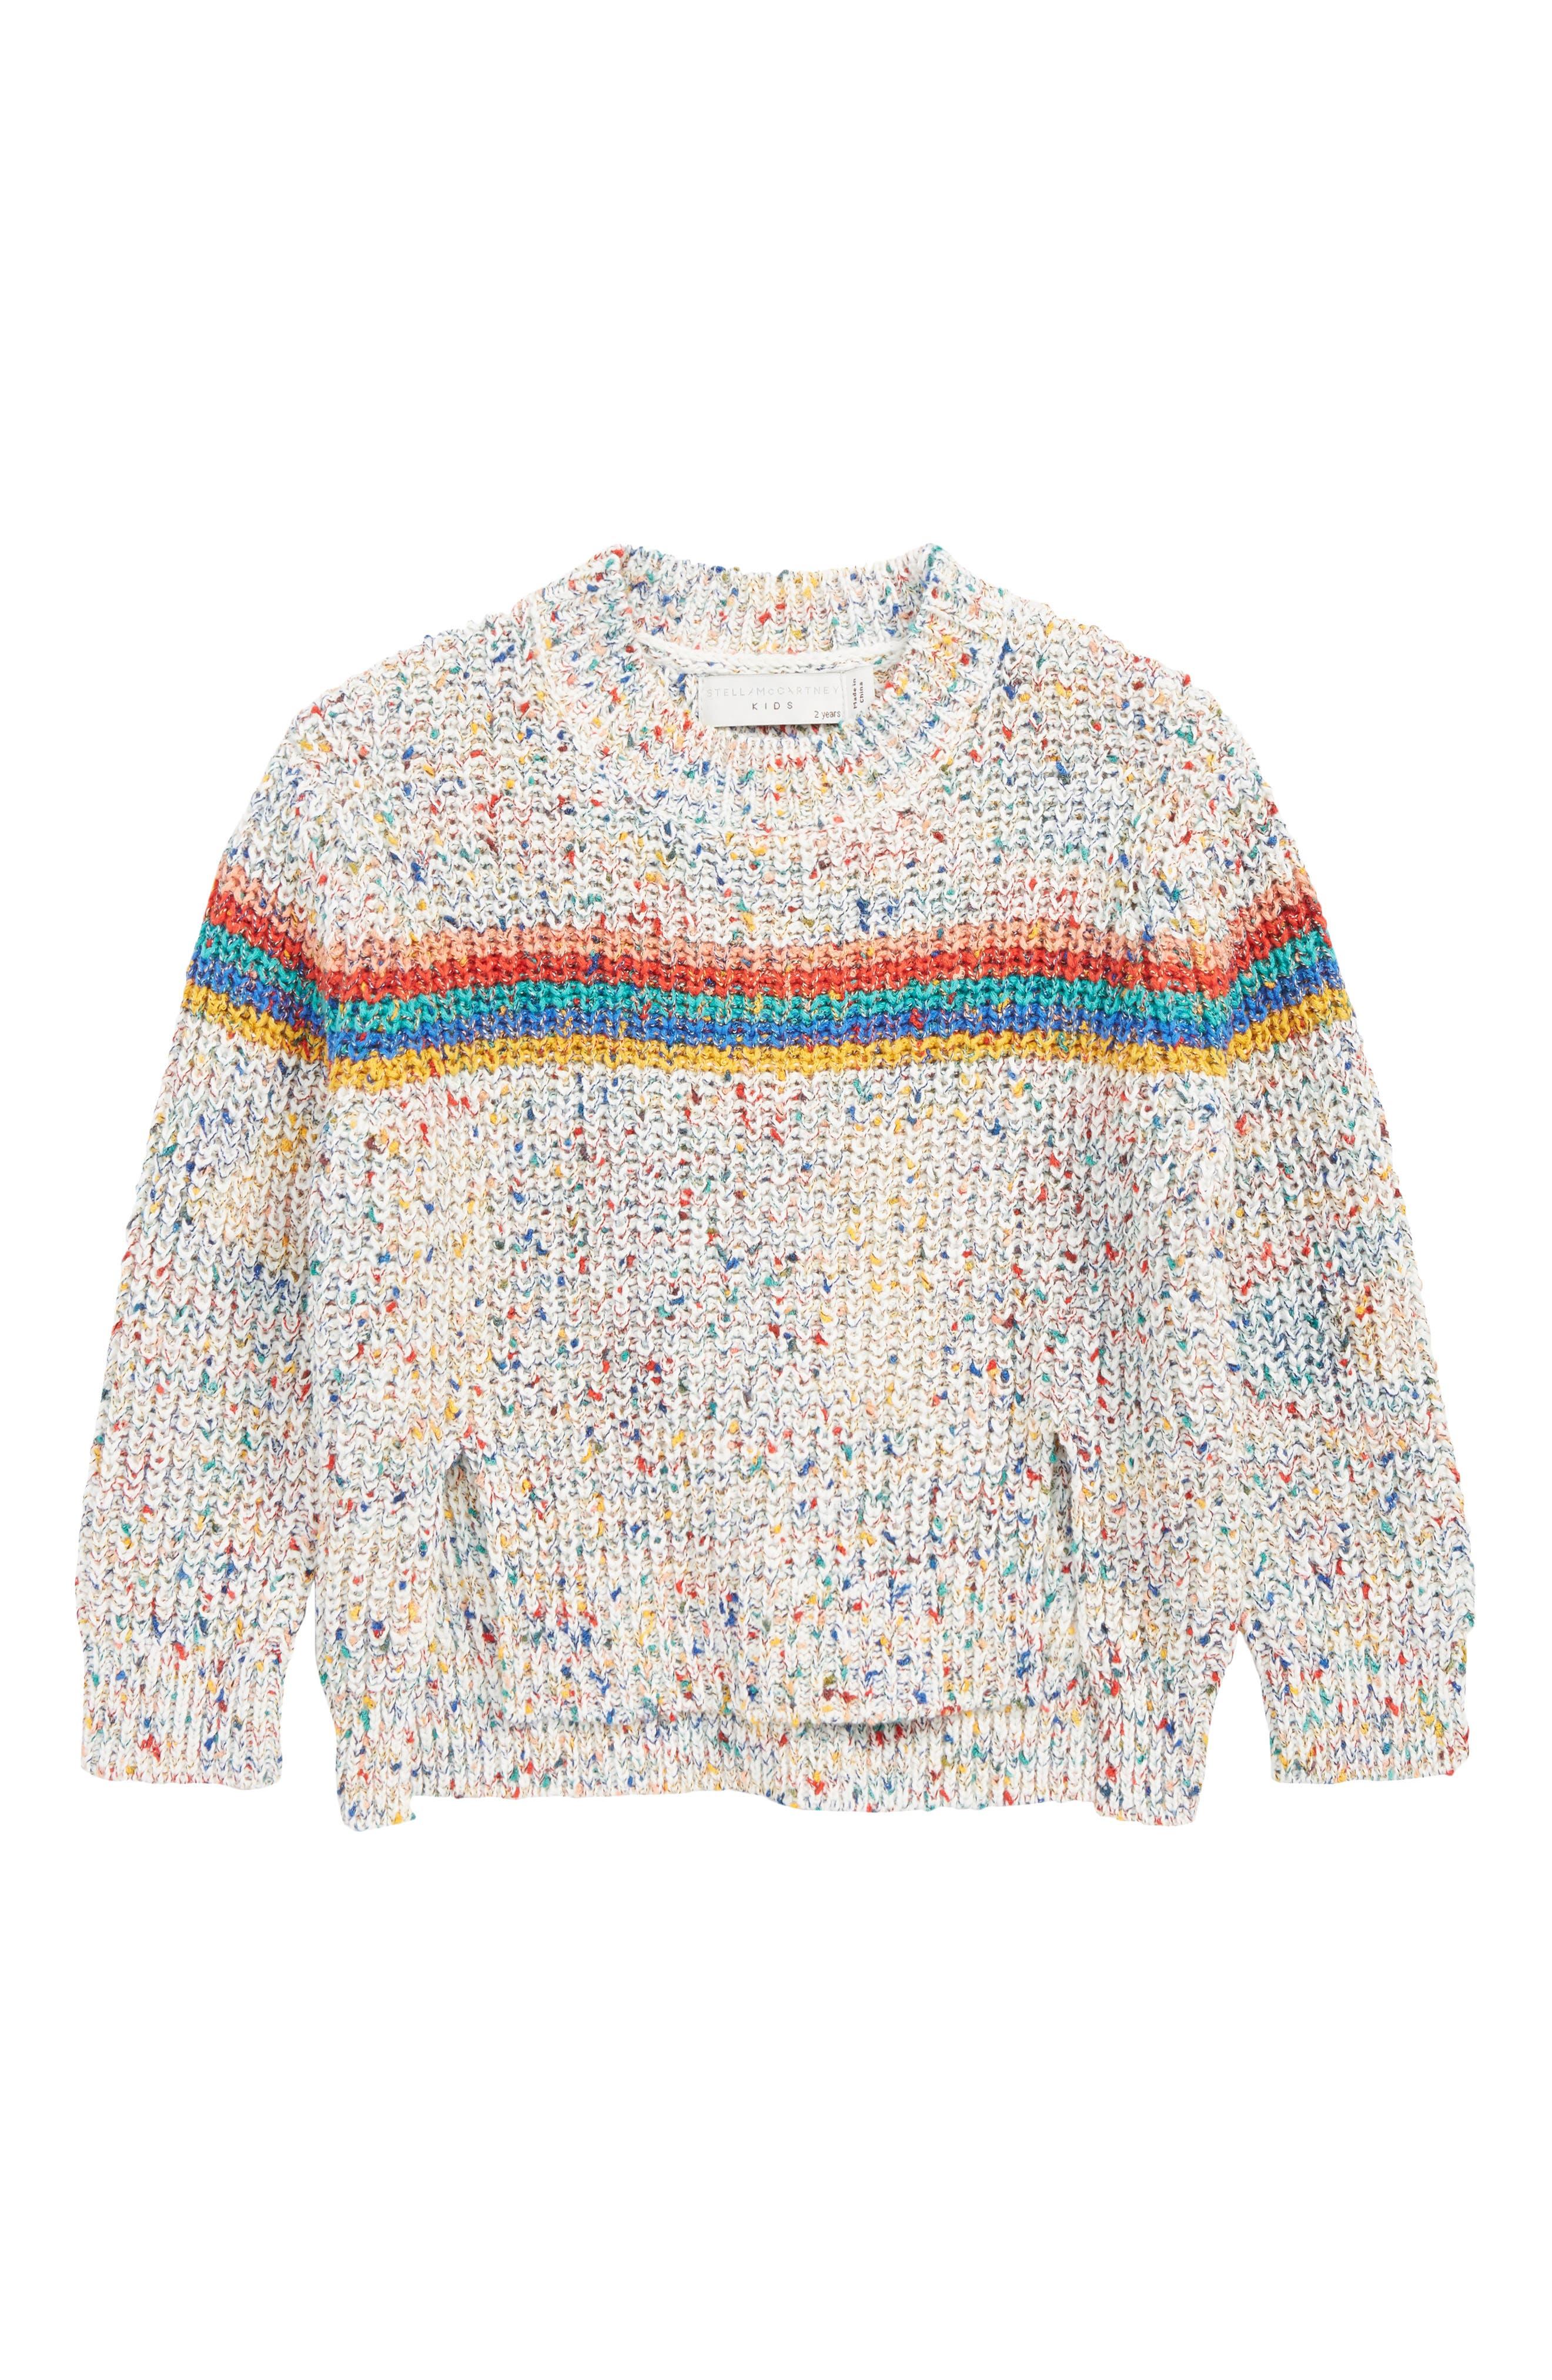 STELLA MCCARTNEY KIDS Stella McCartney Rainbow Sweater, Main, color, MULTI